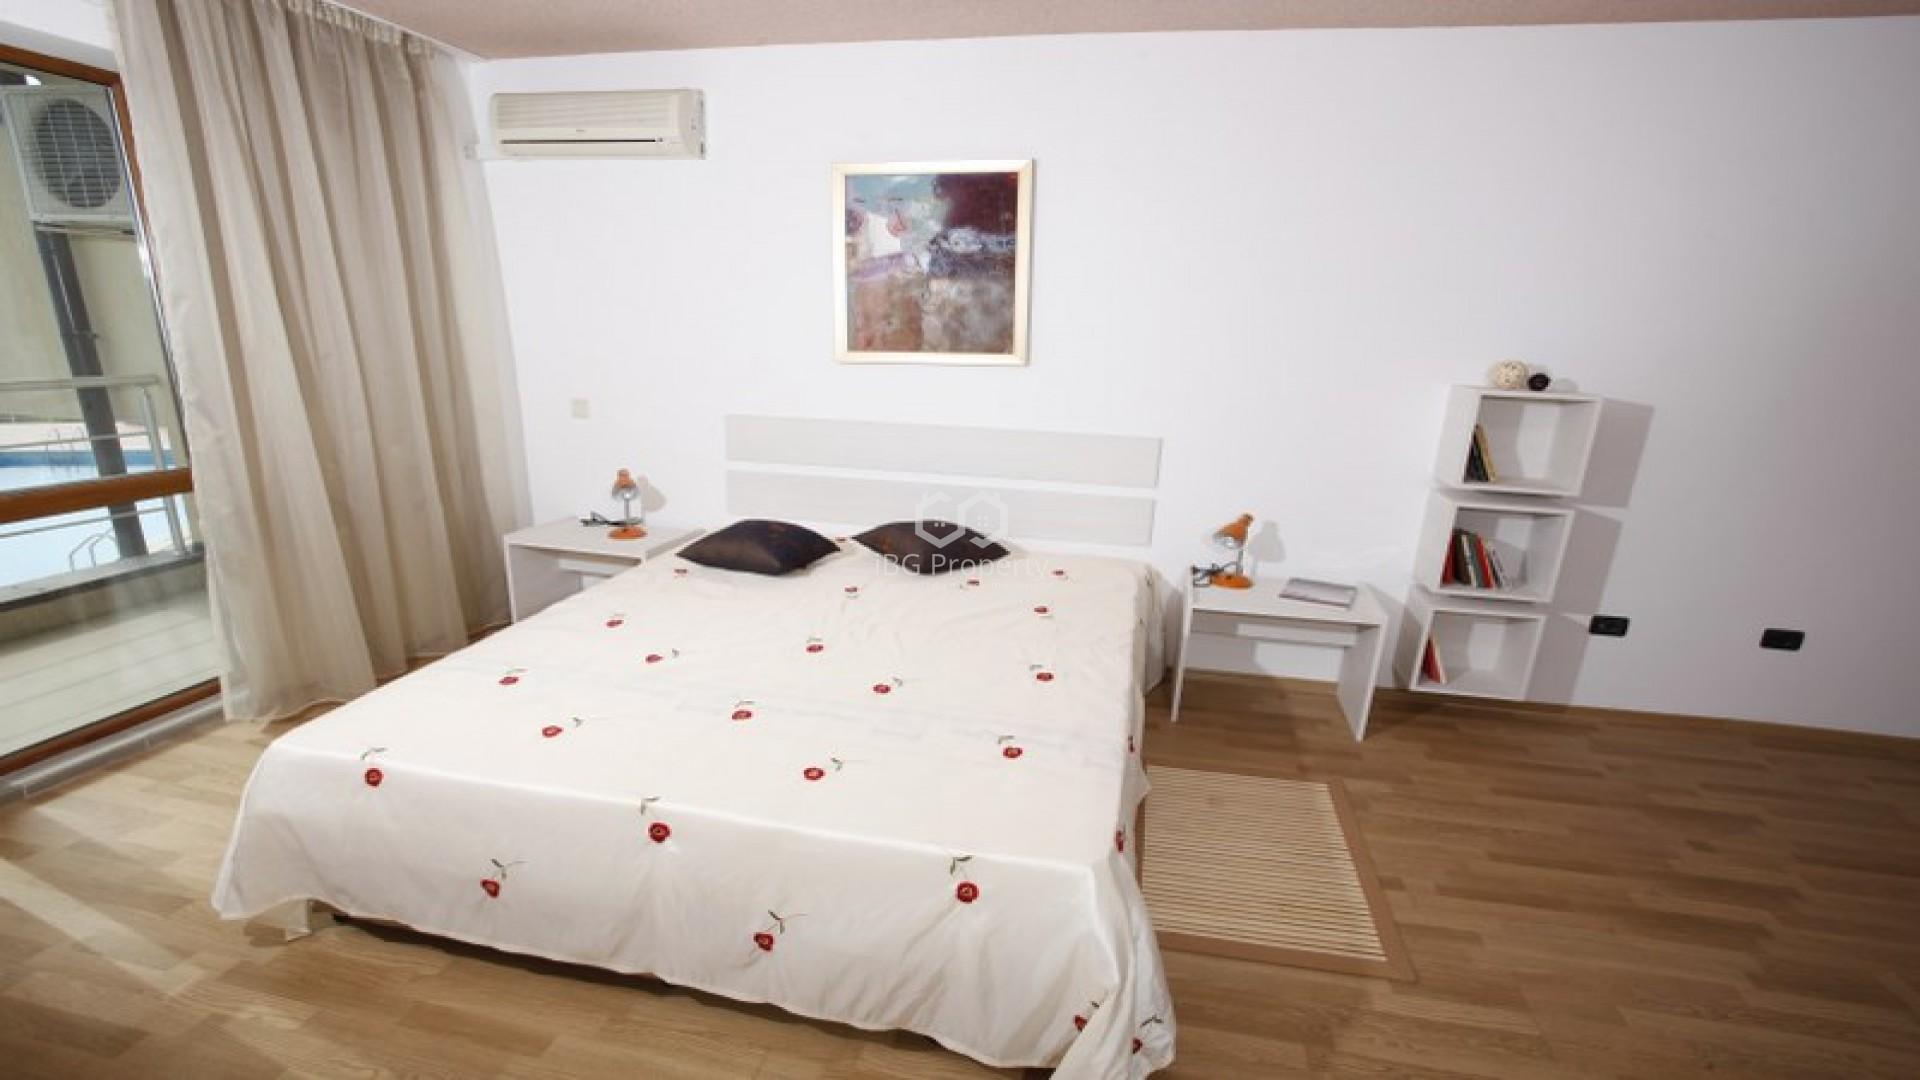 ЕКСКЛУЗИВНА ОФЕРТА! Двустаен апартамент Бяла  72 m2